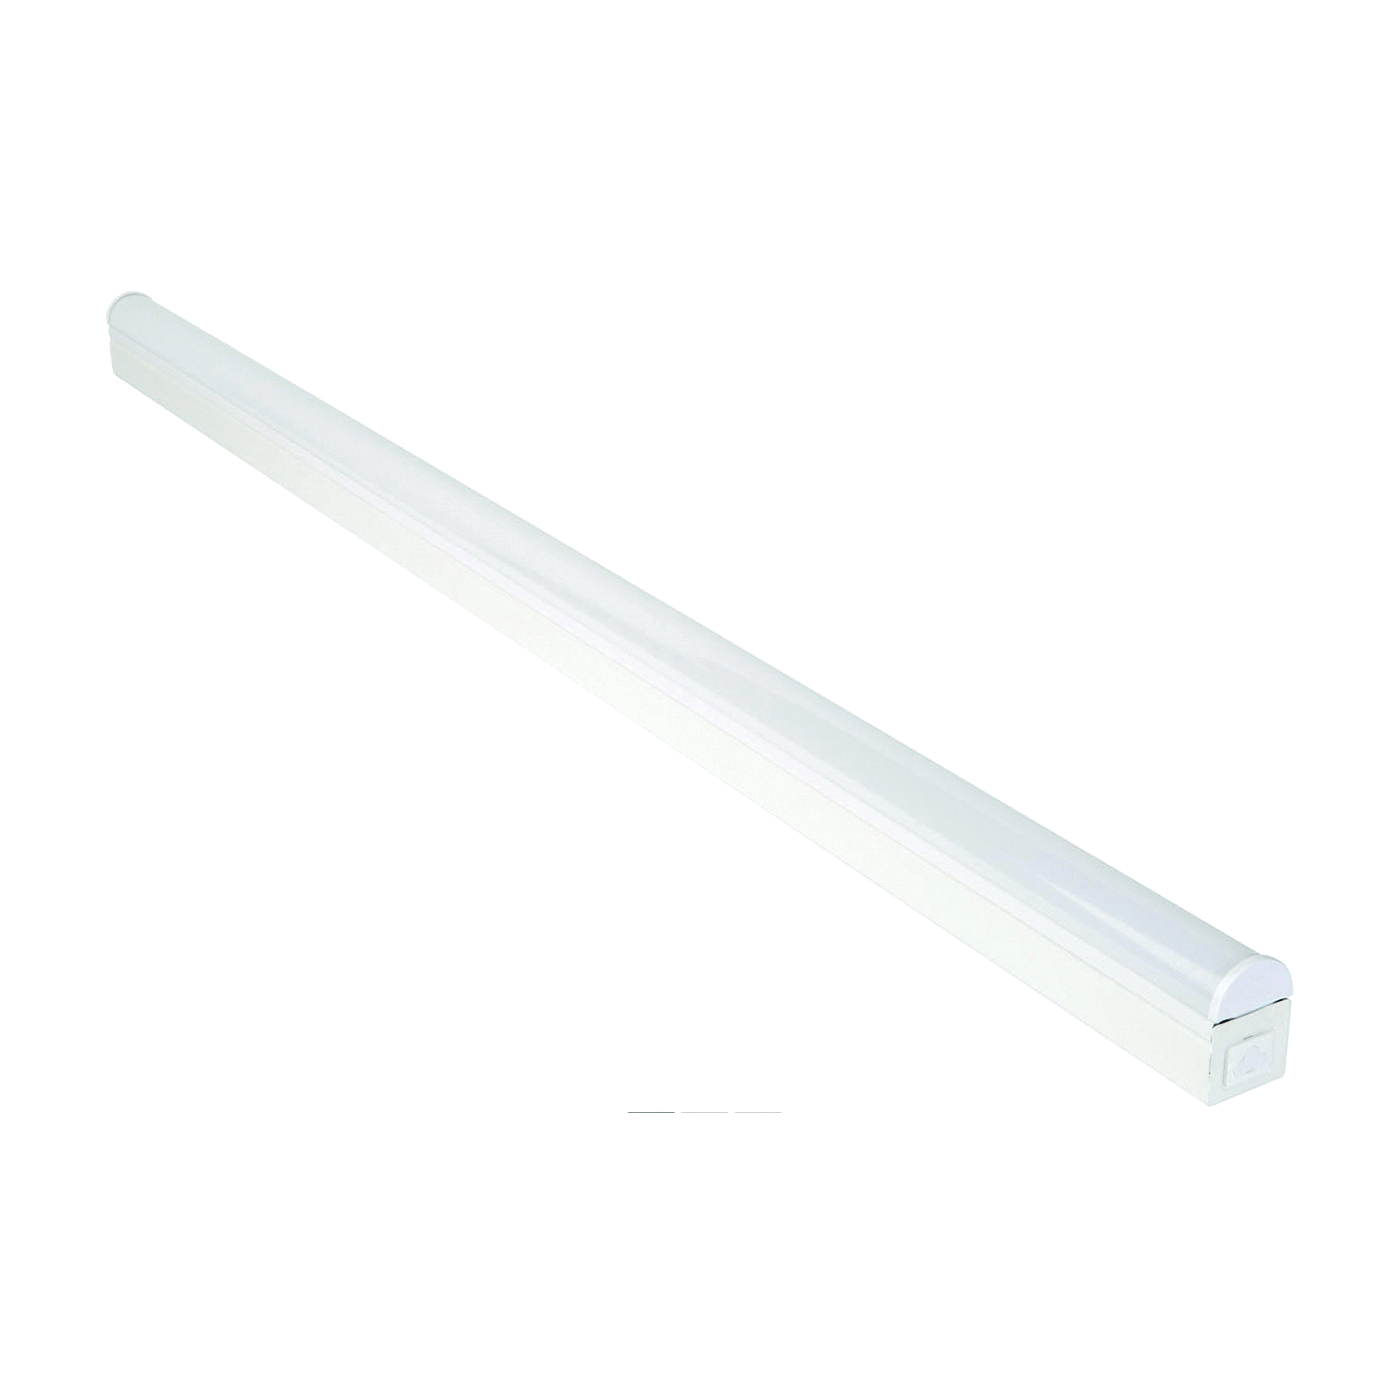 Picture of ETI 54261143 Linkable Striplight, 120 VAC, 20 W, LED Lamp, 1800 Lumens, 4000 K Color Temp